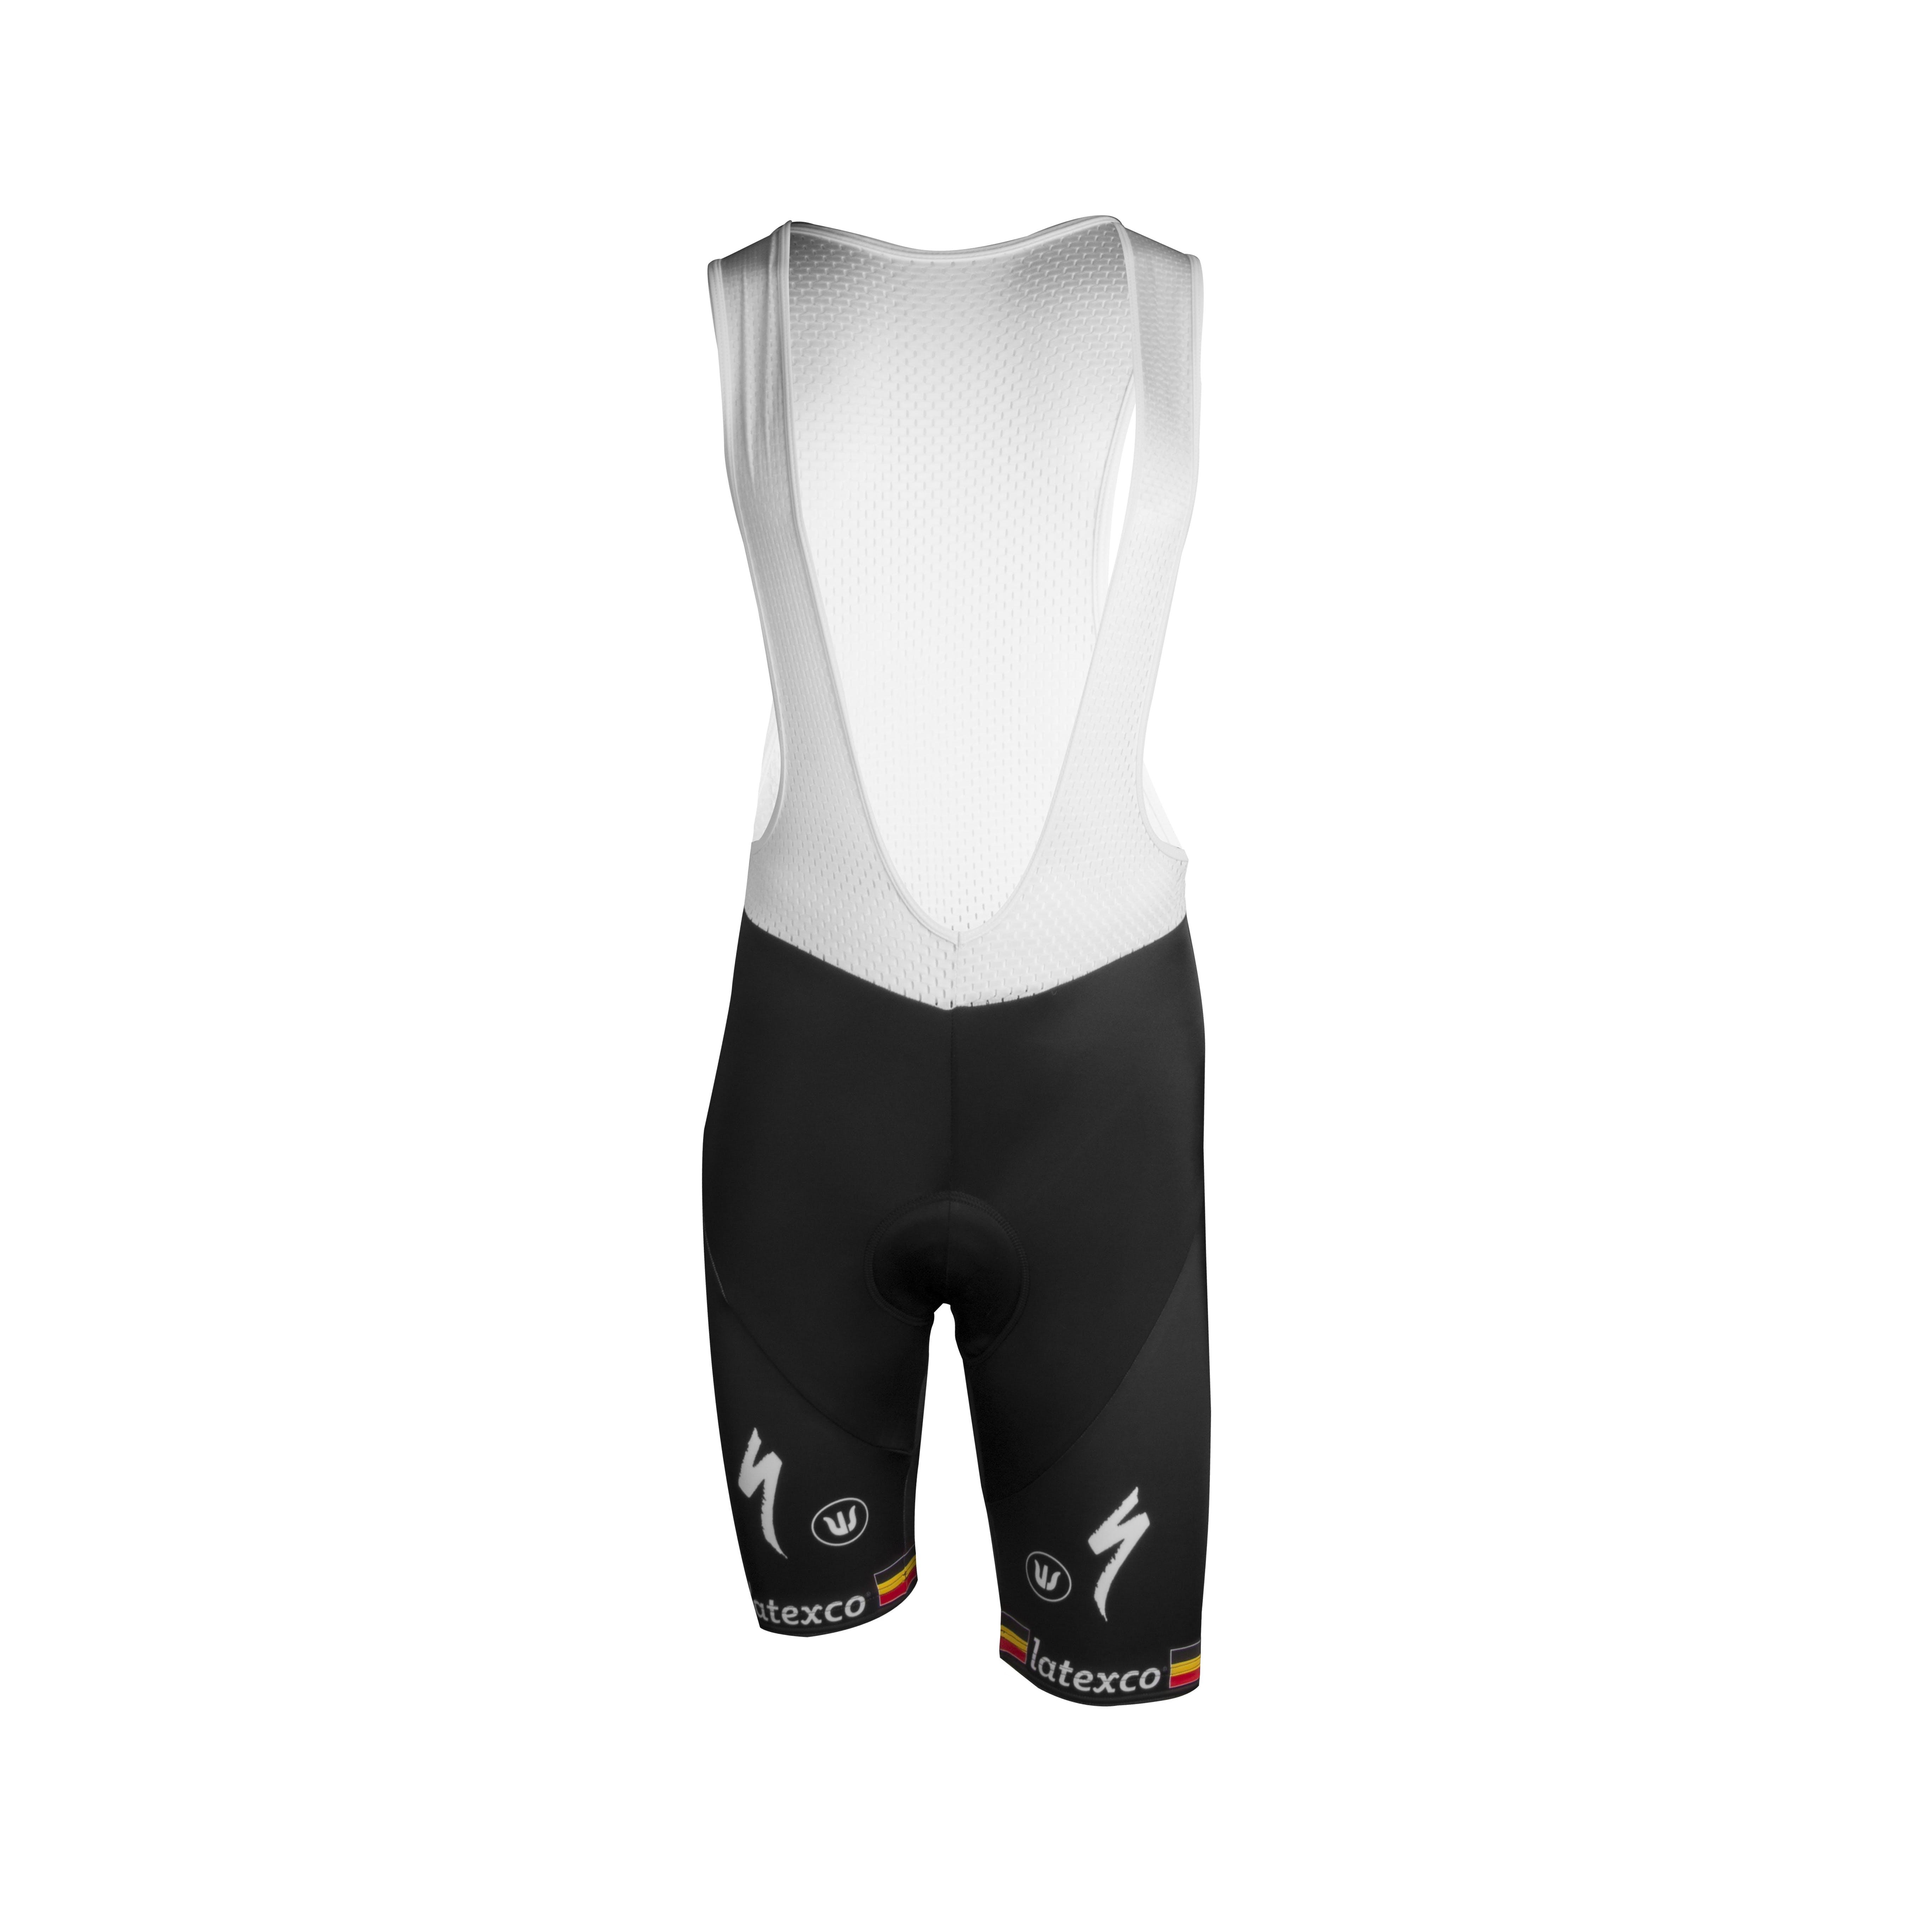 Deceuninck Quick-Step Champion Belgium Bib Shorts